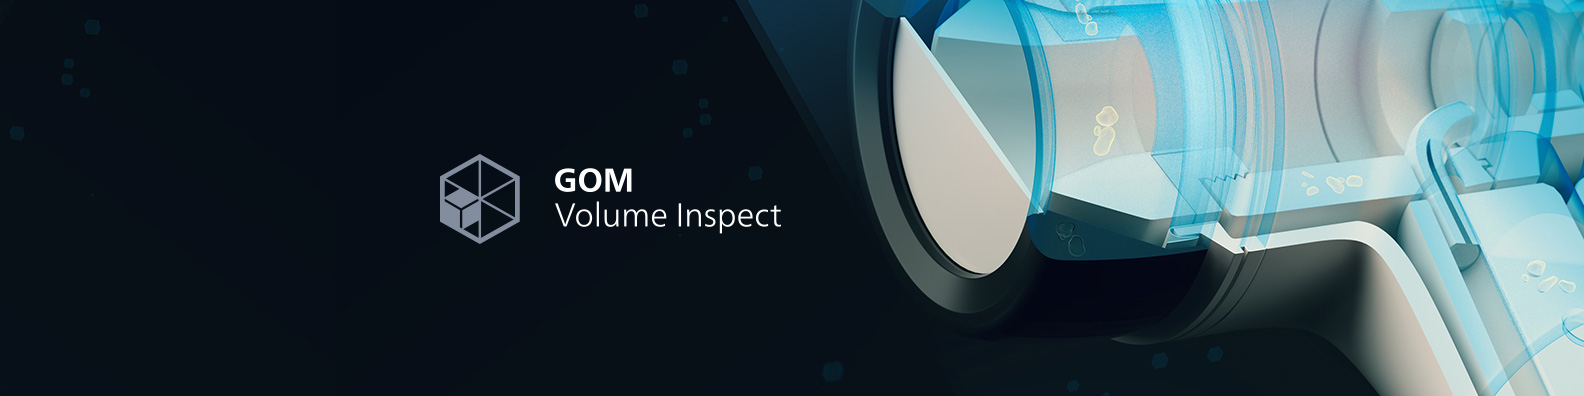 GOM Volume Inspect Baner